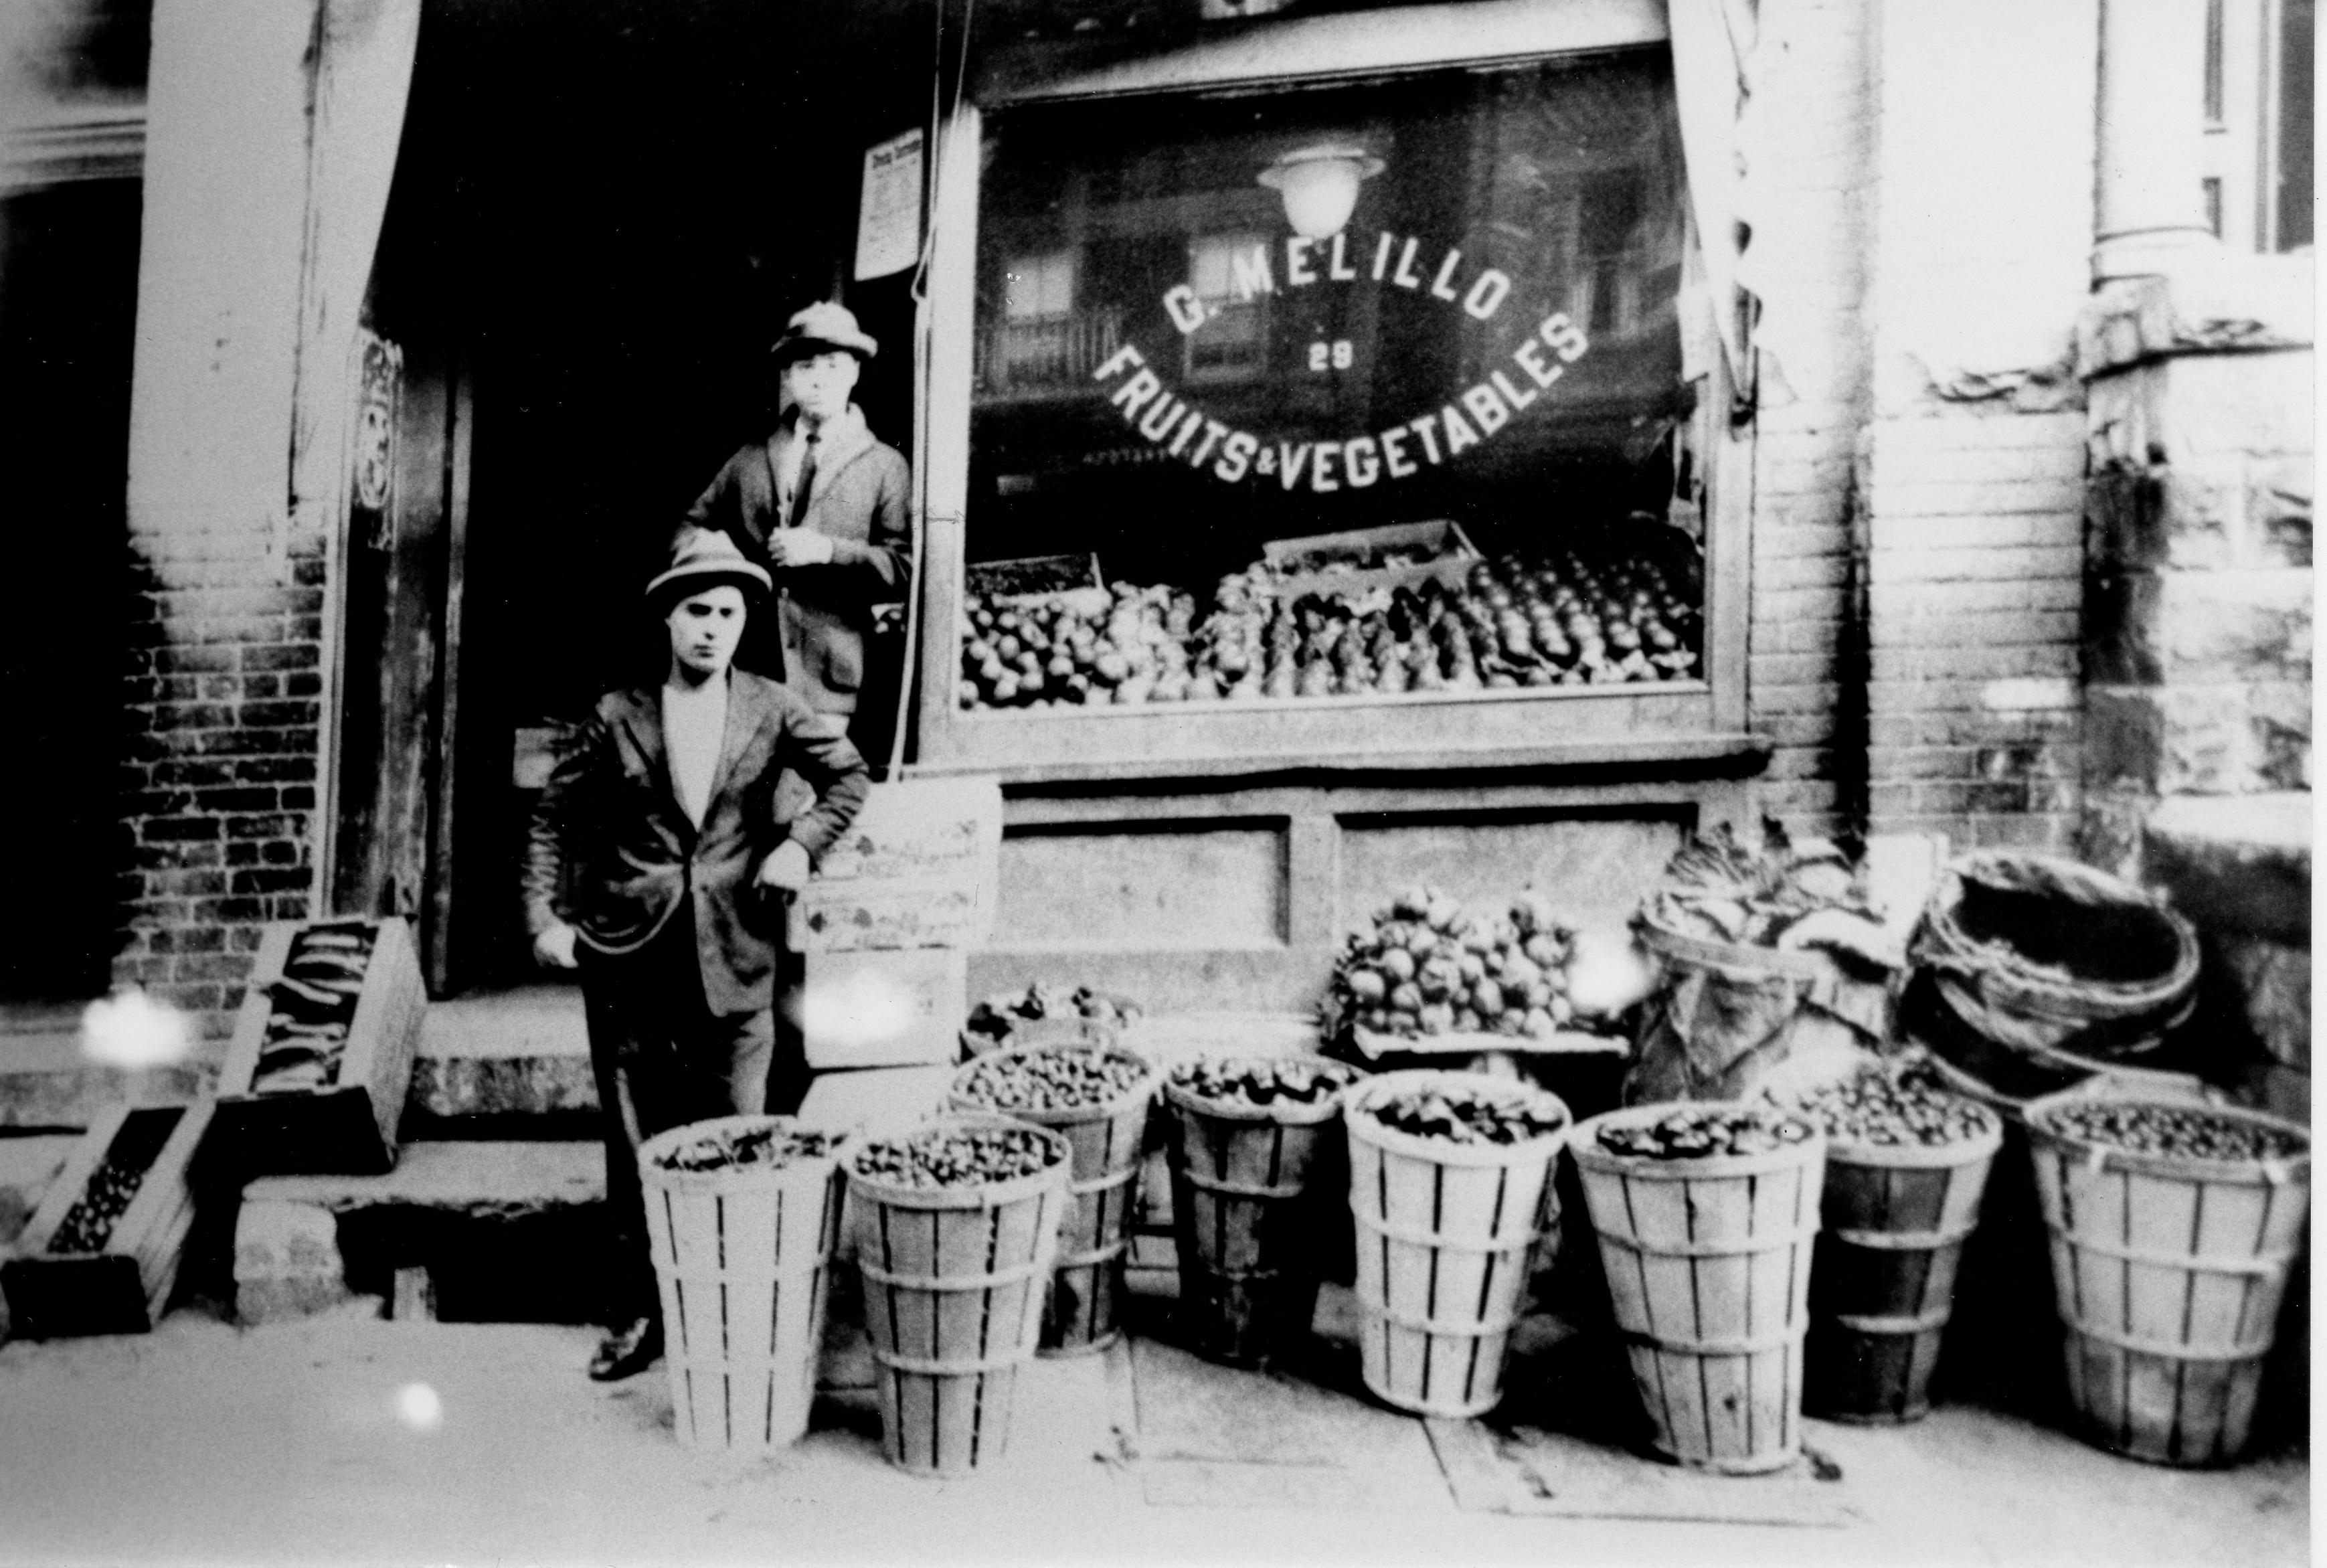 Italian Produce Store